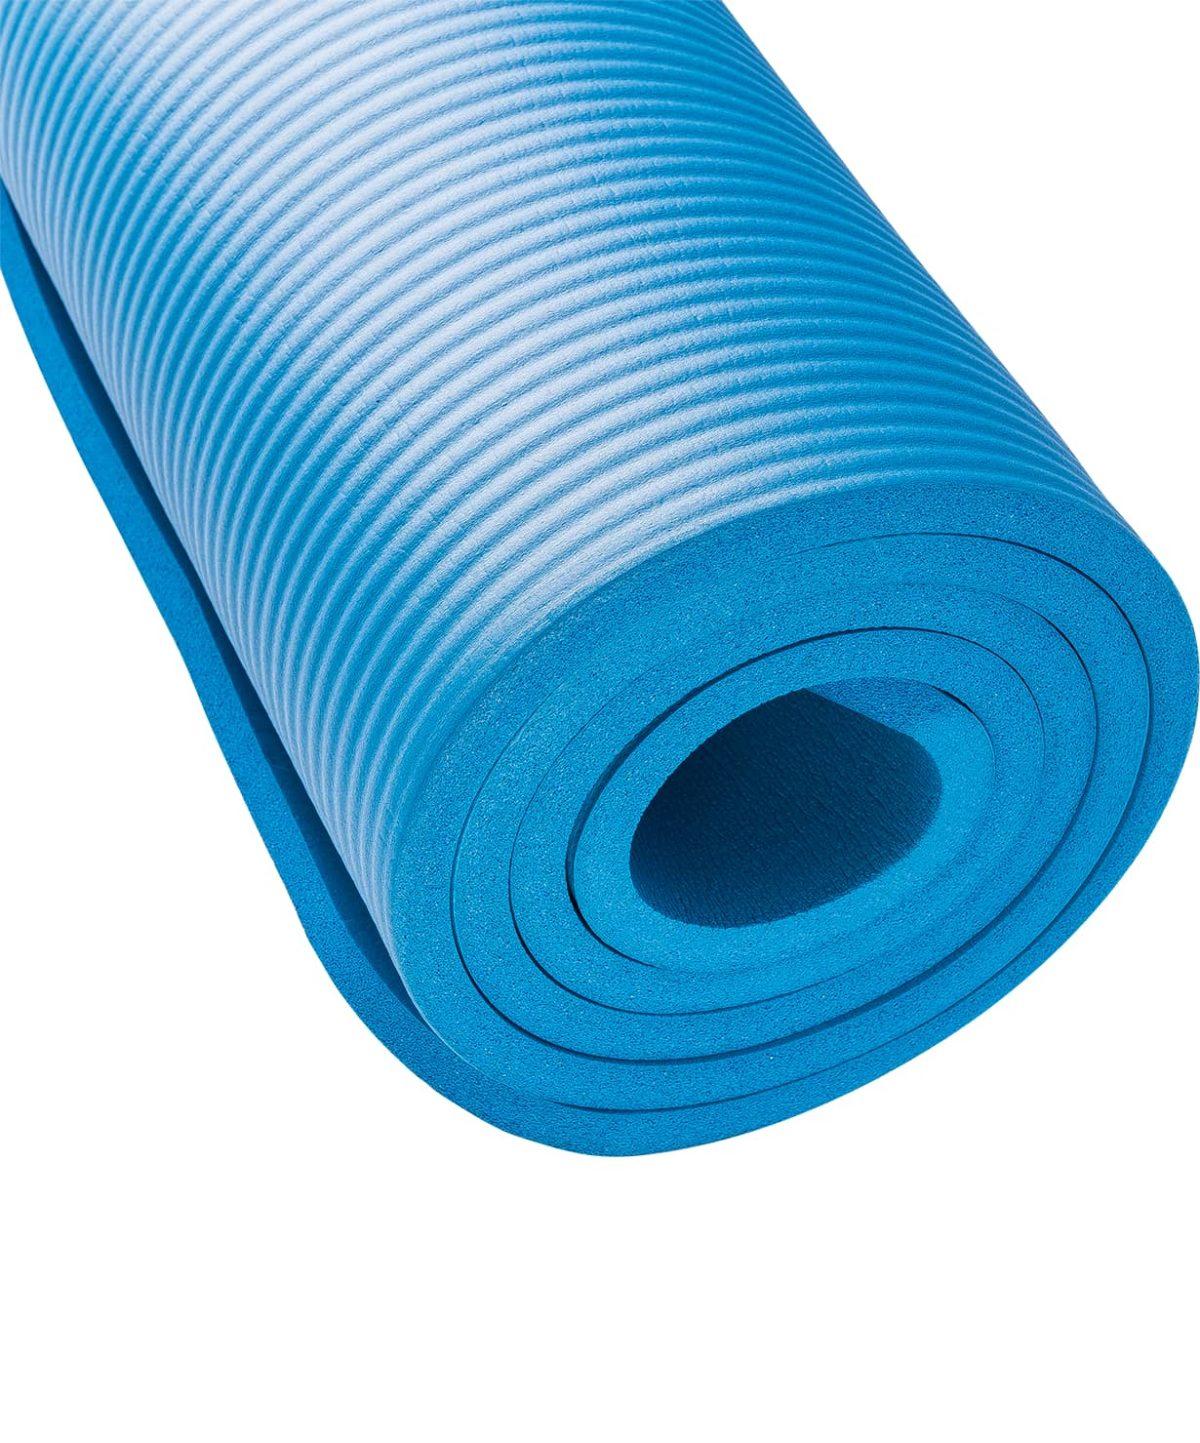 STARFIT Коврик для йоги FM-301 183x58x1,2 см: синий - 2